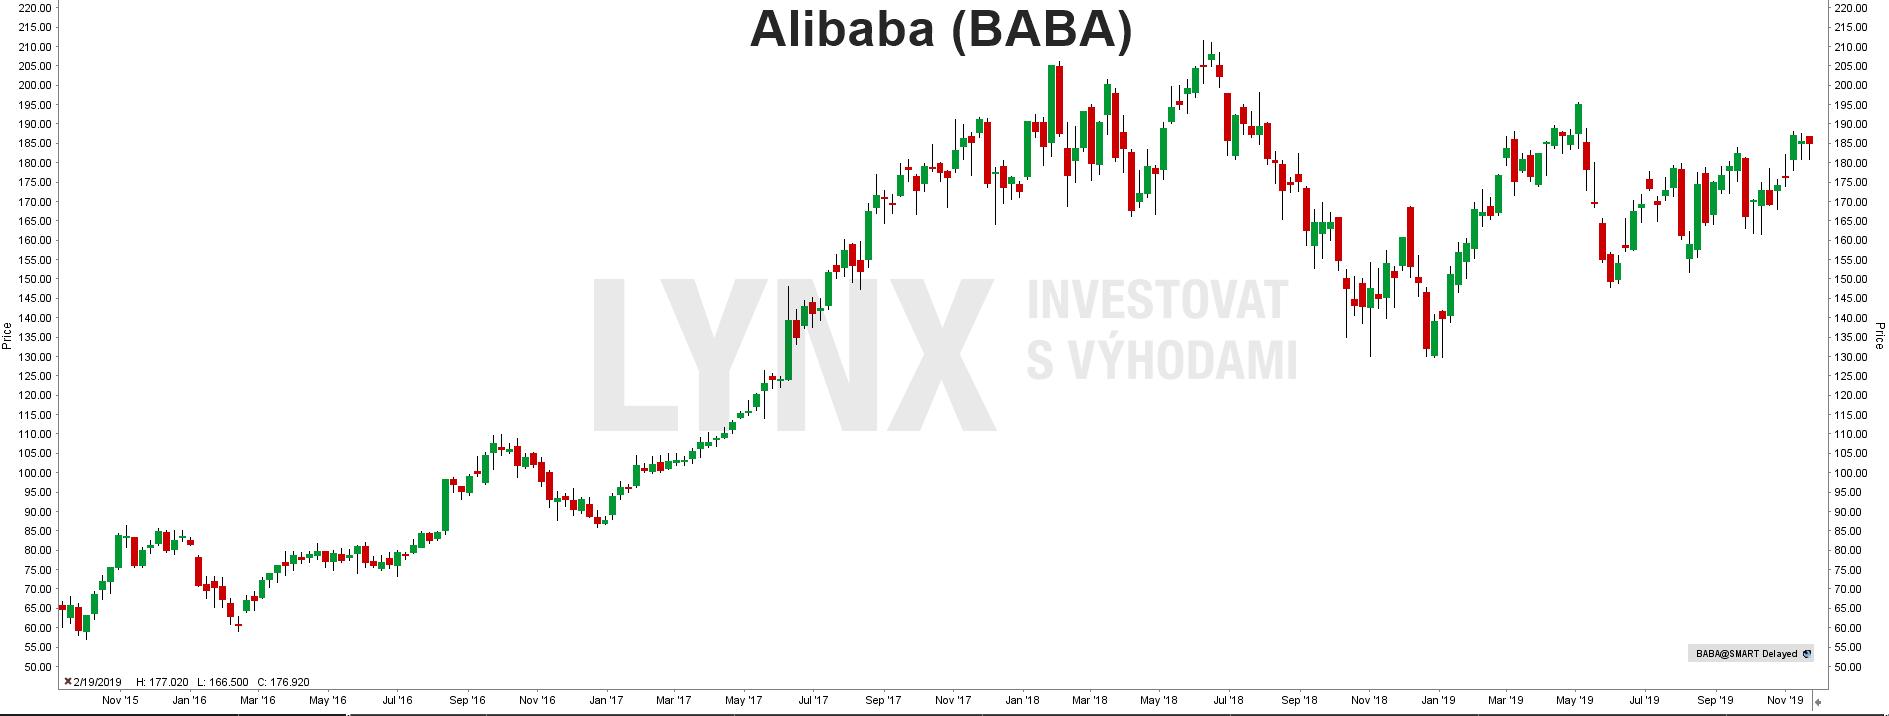 Akcie Alibaba (BABA)